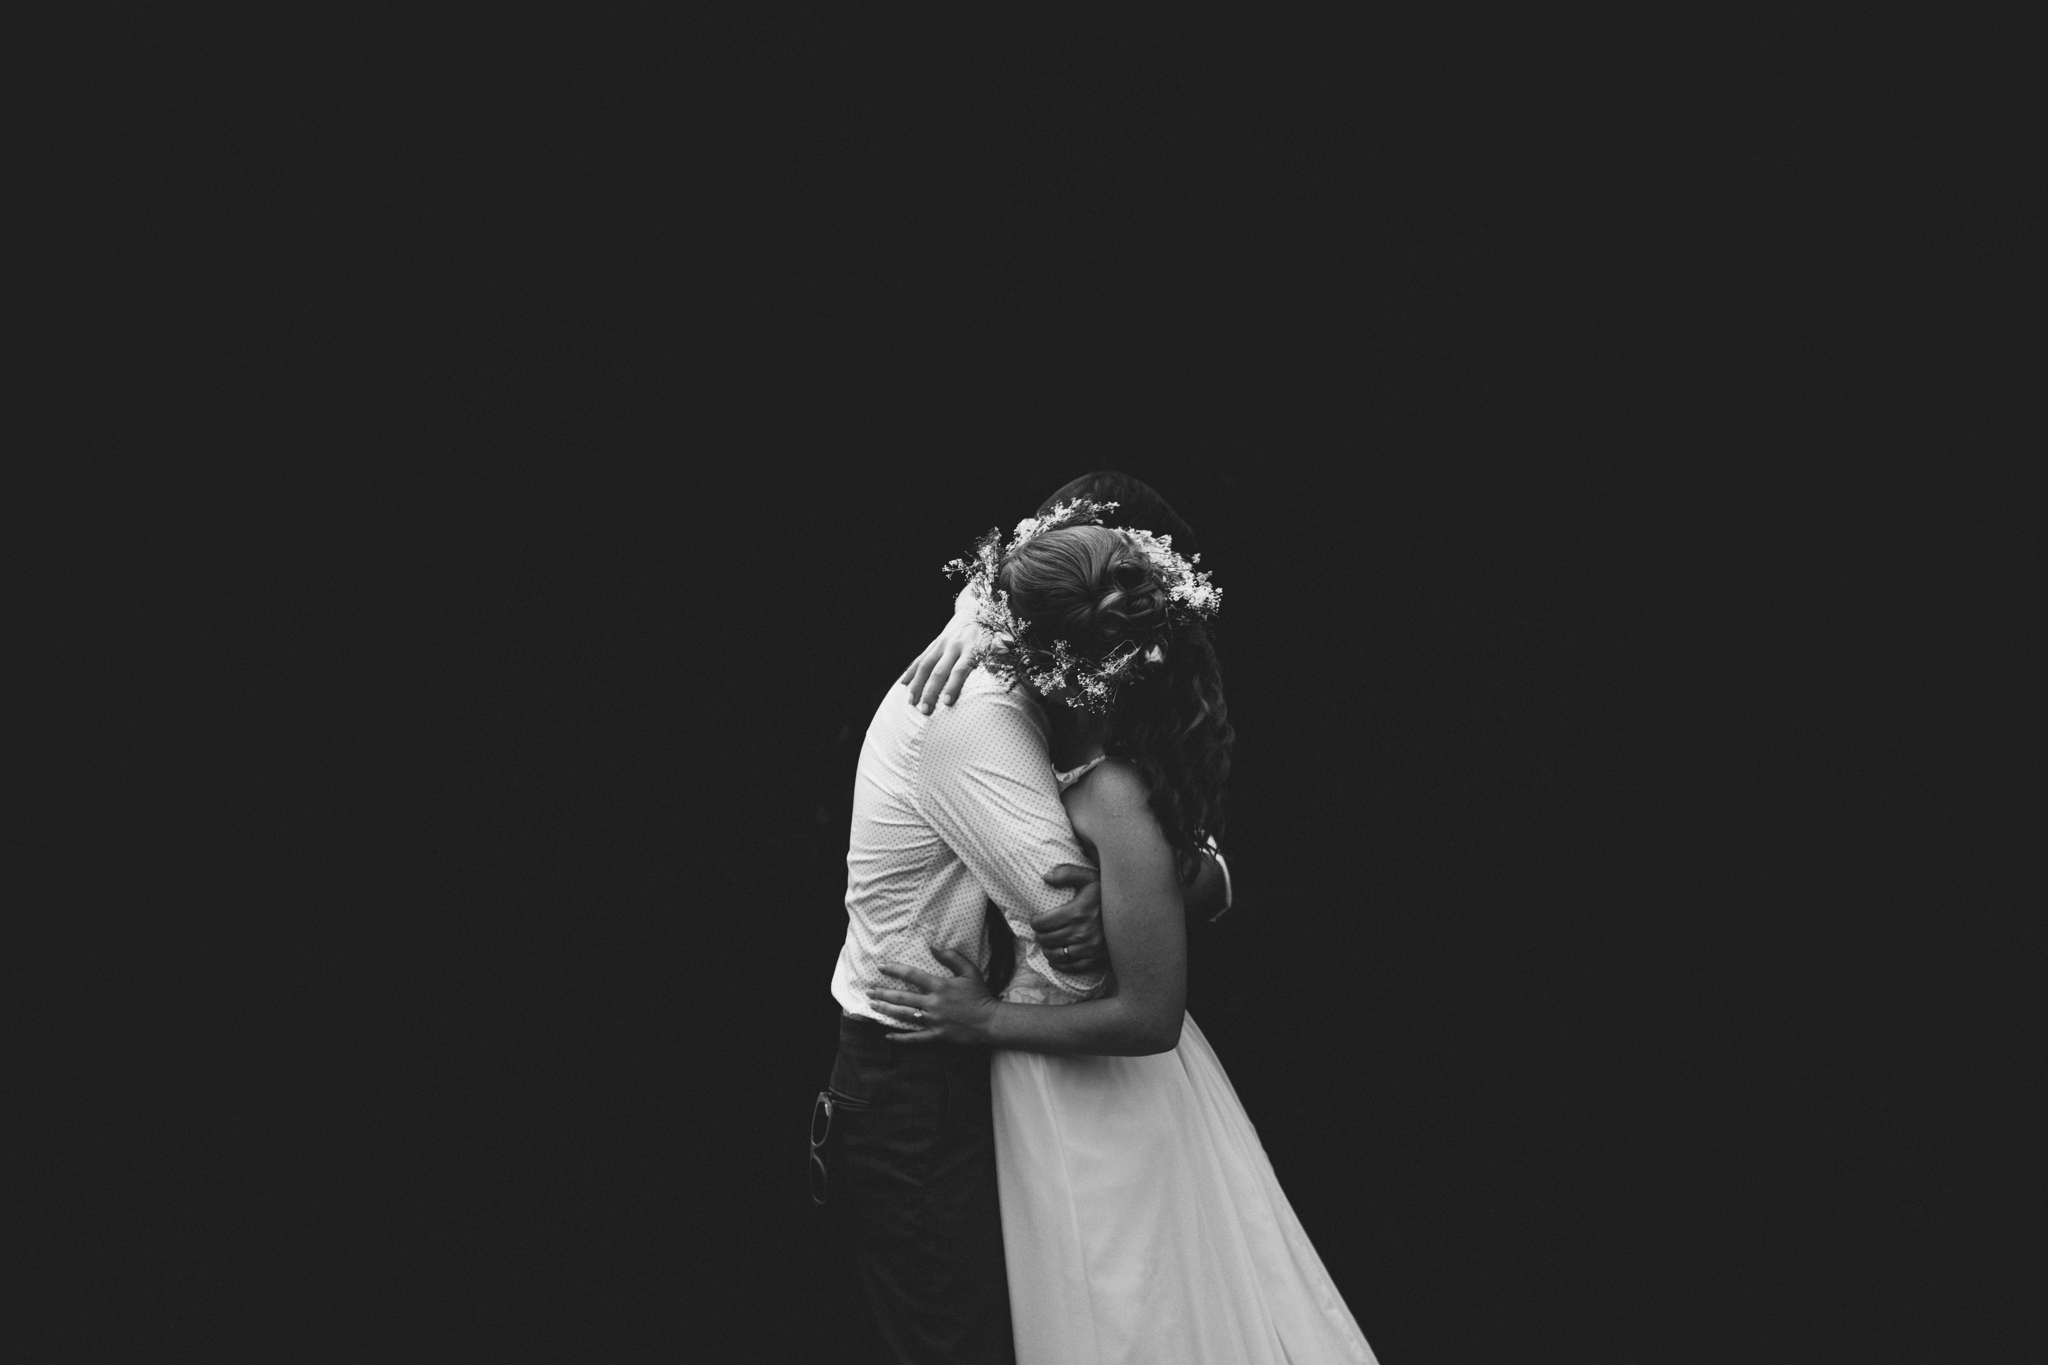 Couple embraces during photos at a destination wedding at Lake Lure Inn, NC.